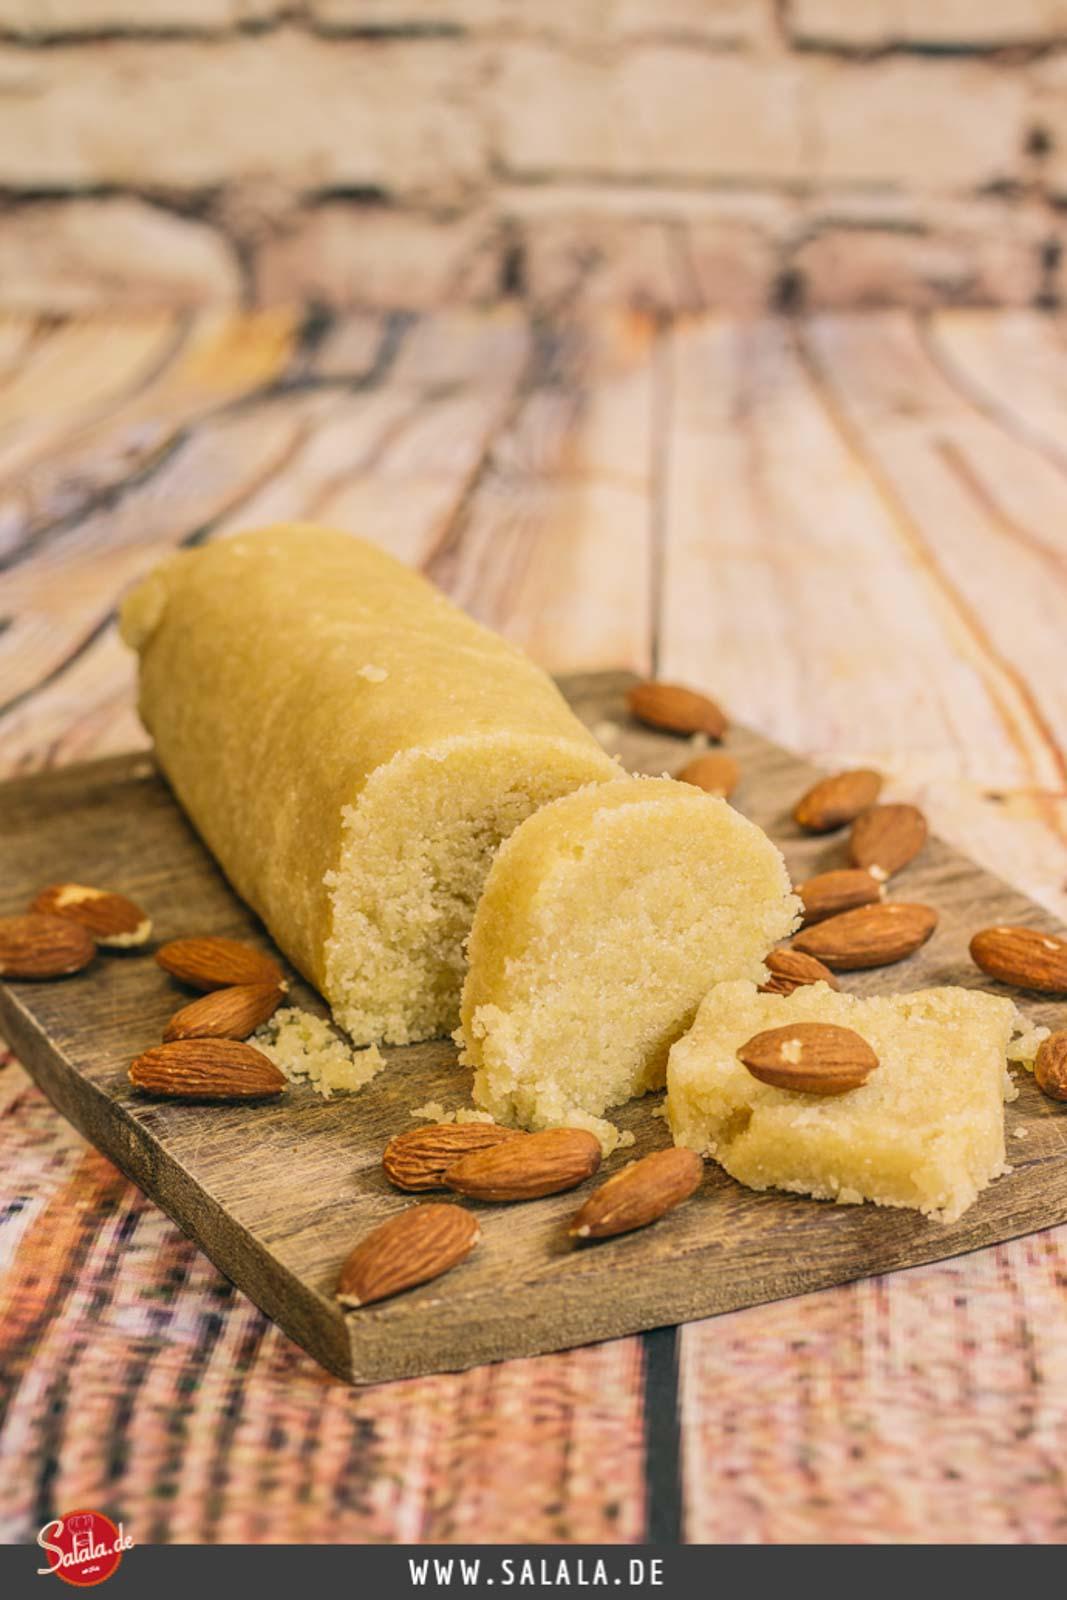 Low Carb Marzipan einfach selber machen - by salala.de - Marzipan ohne Zucker Low Carb glutenfrei zuckerfrei